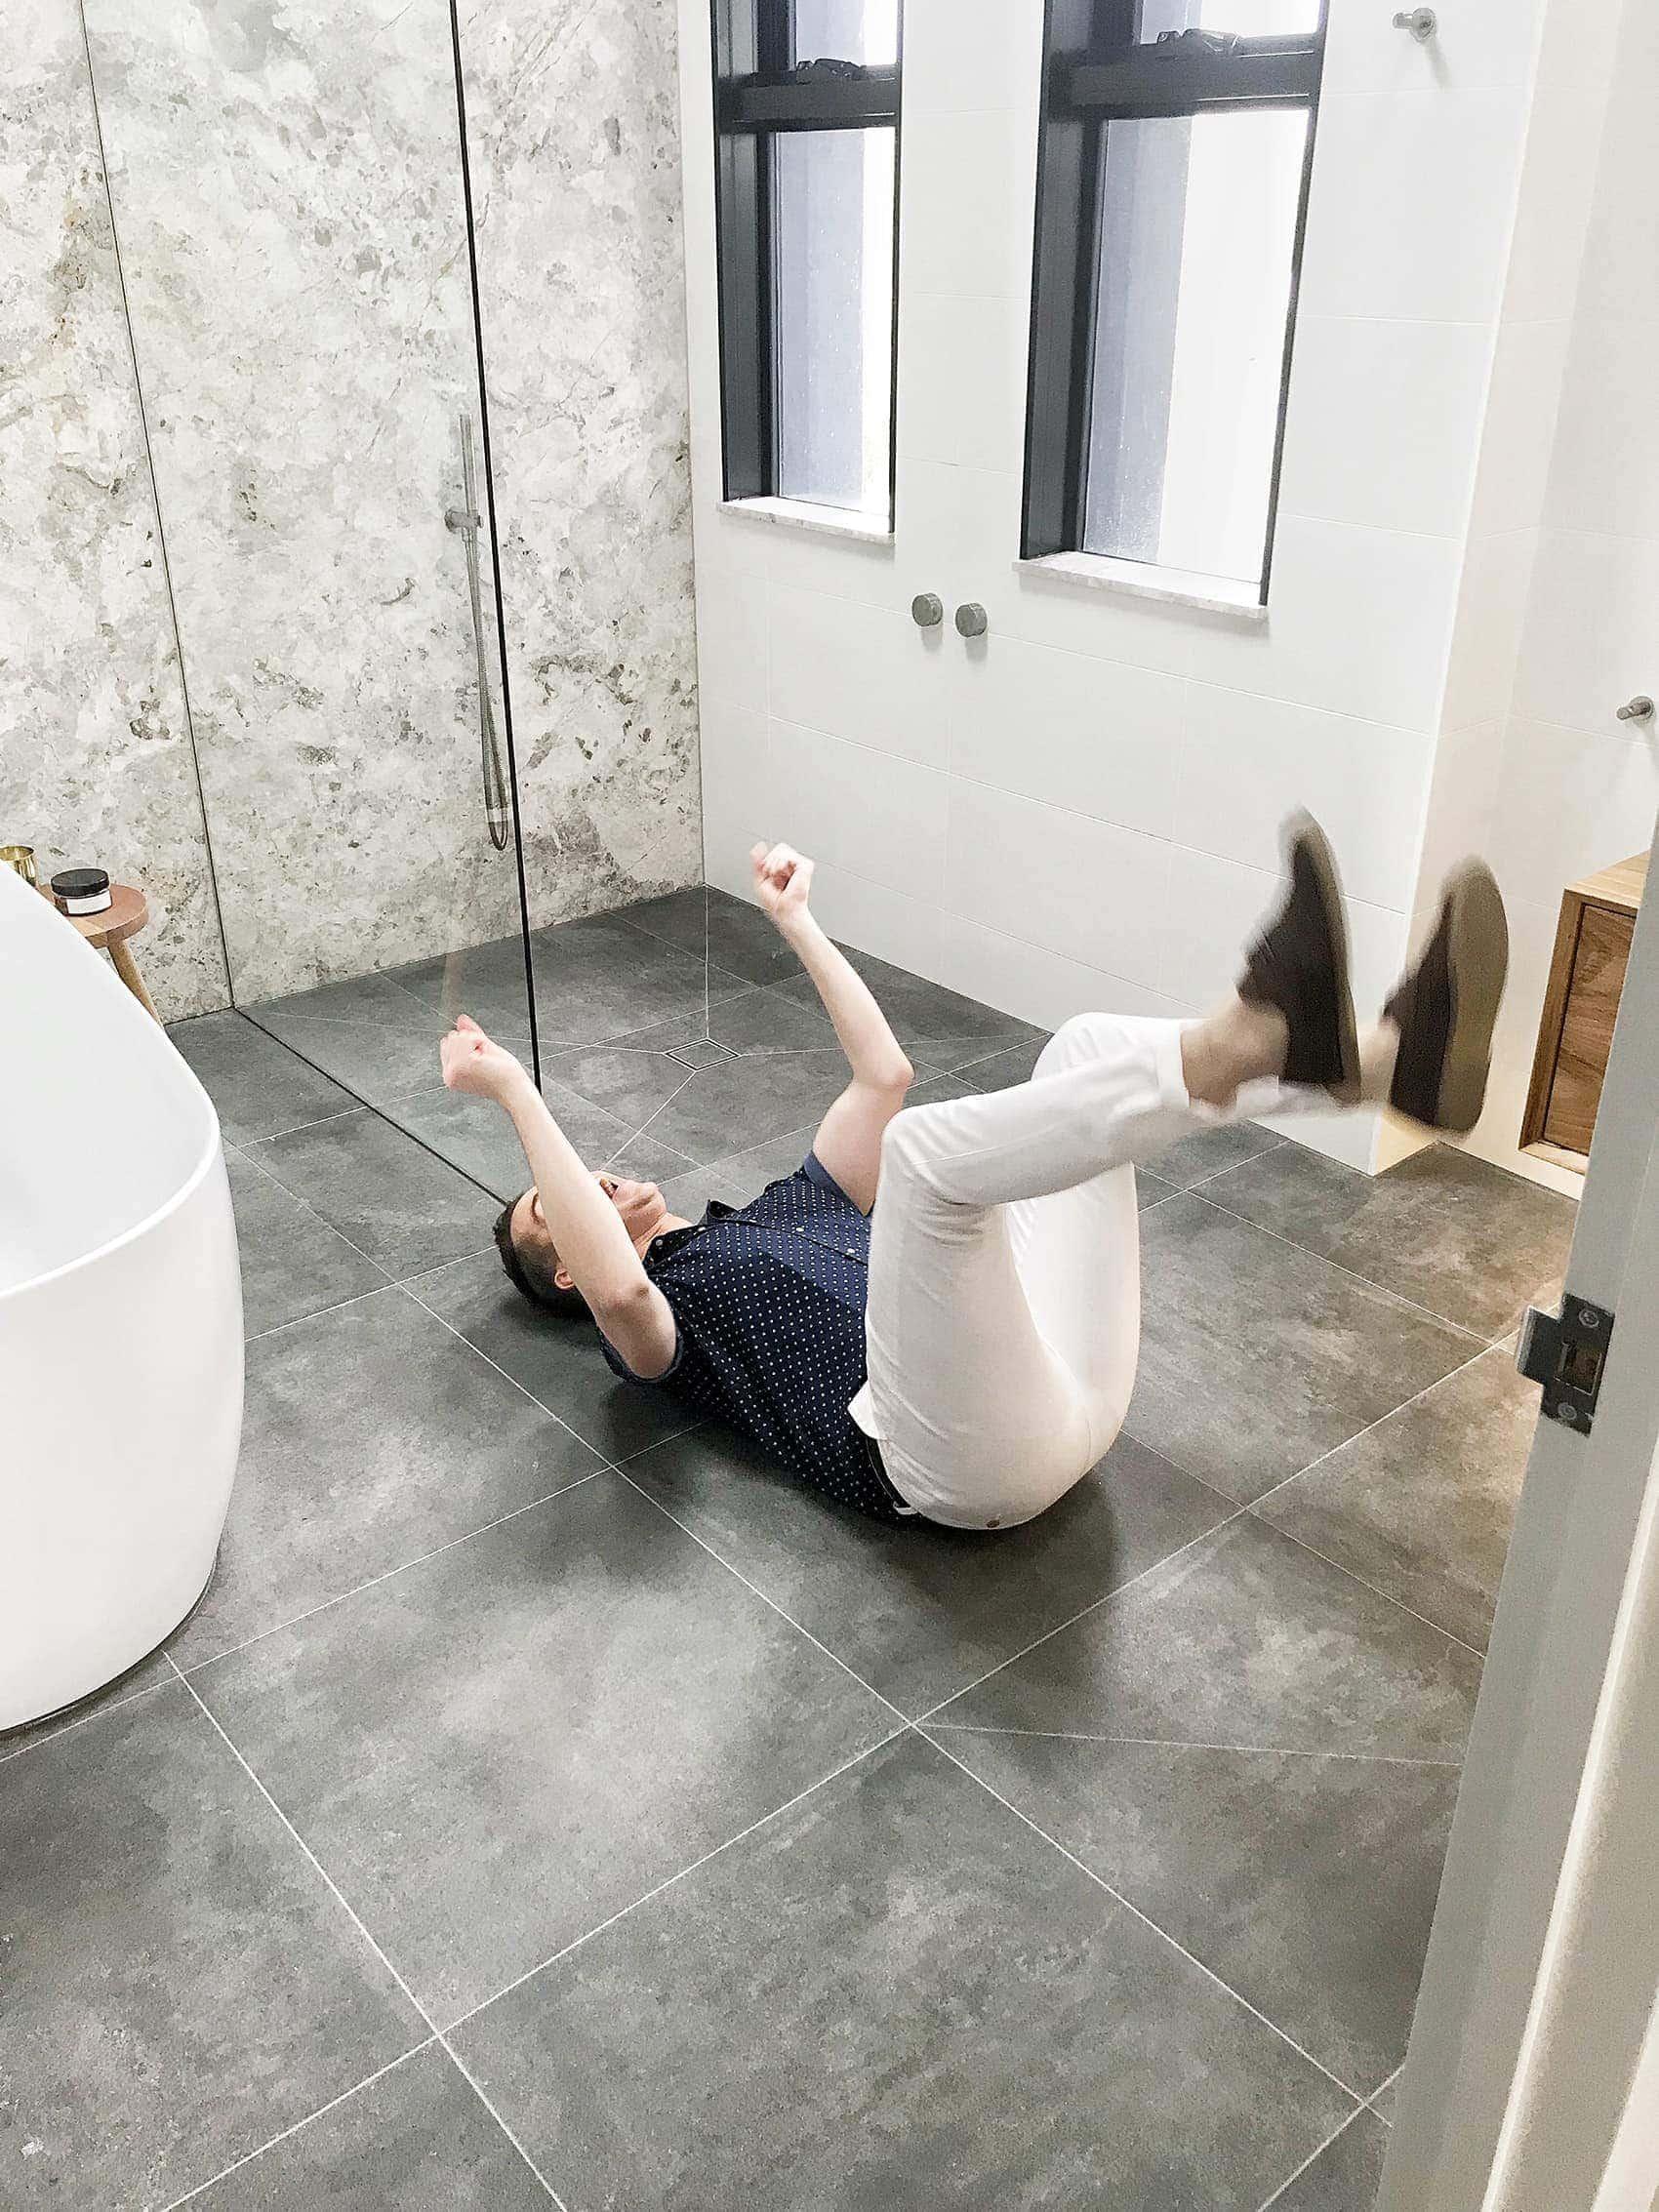 chris carroll in the block apartments 2018 bianca and carla bathroom